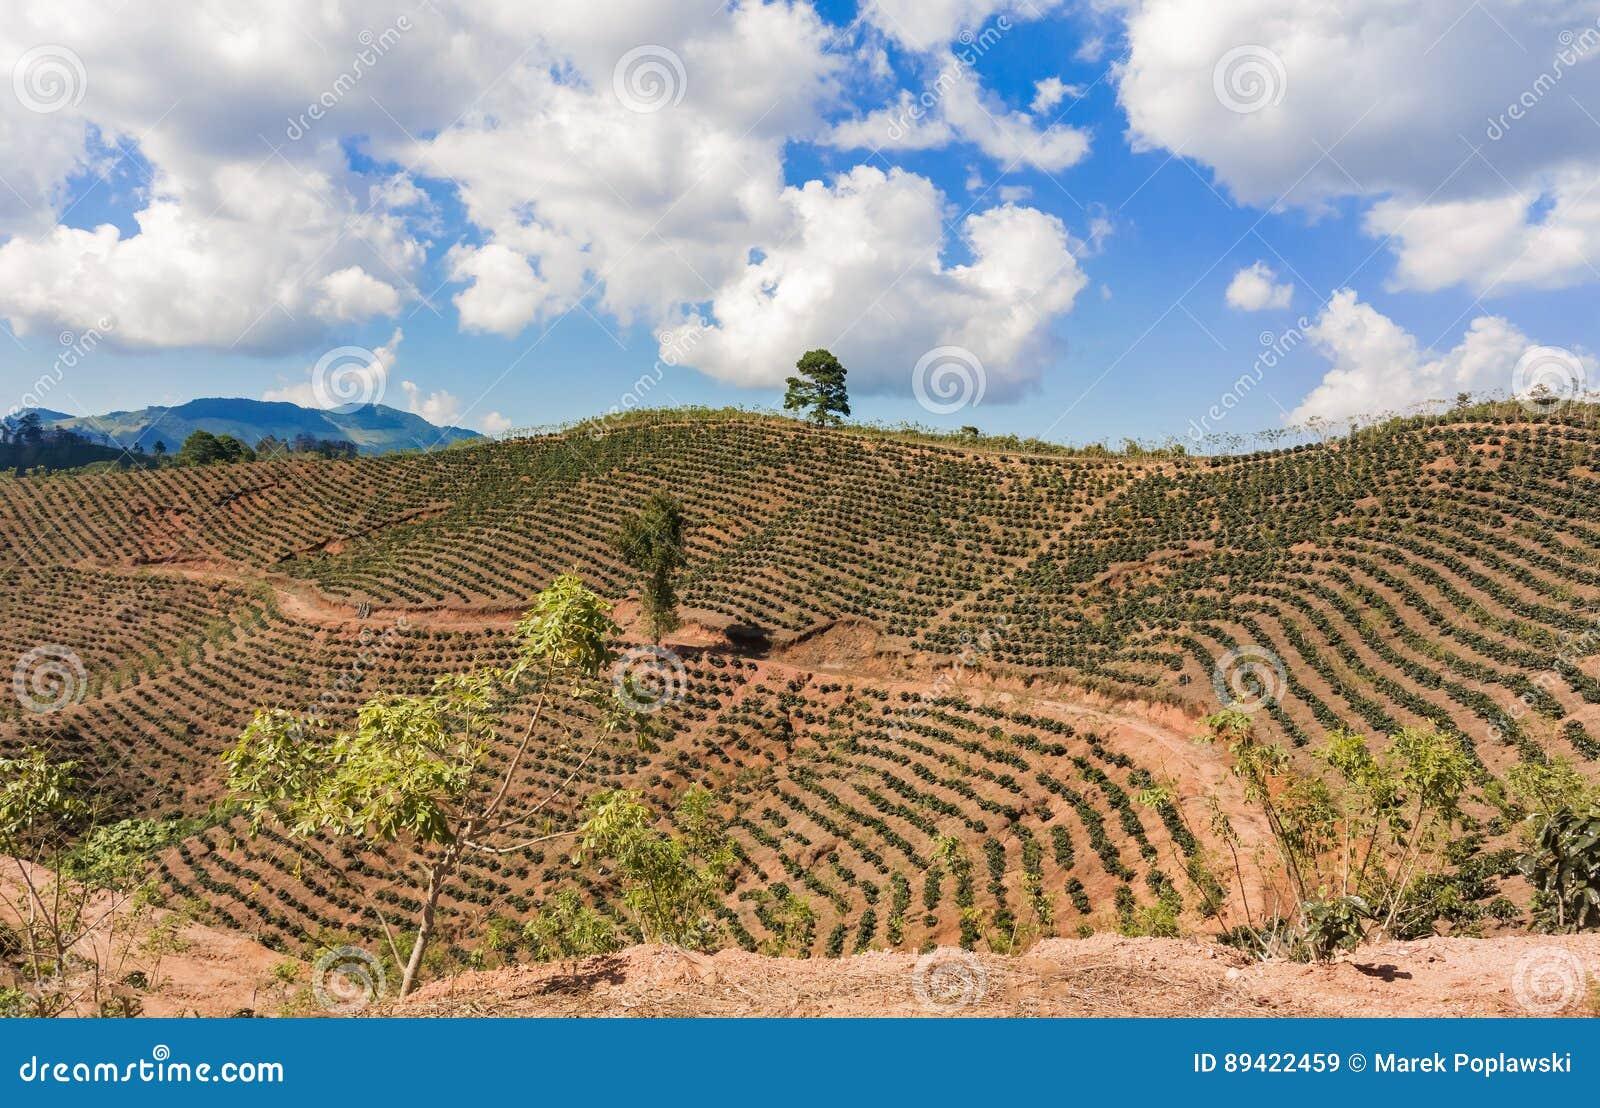 Plantación de café en las montañas de Honduras